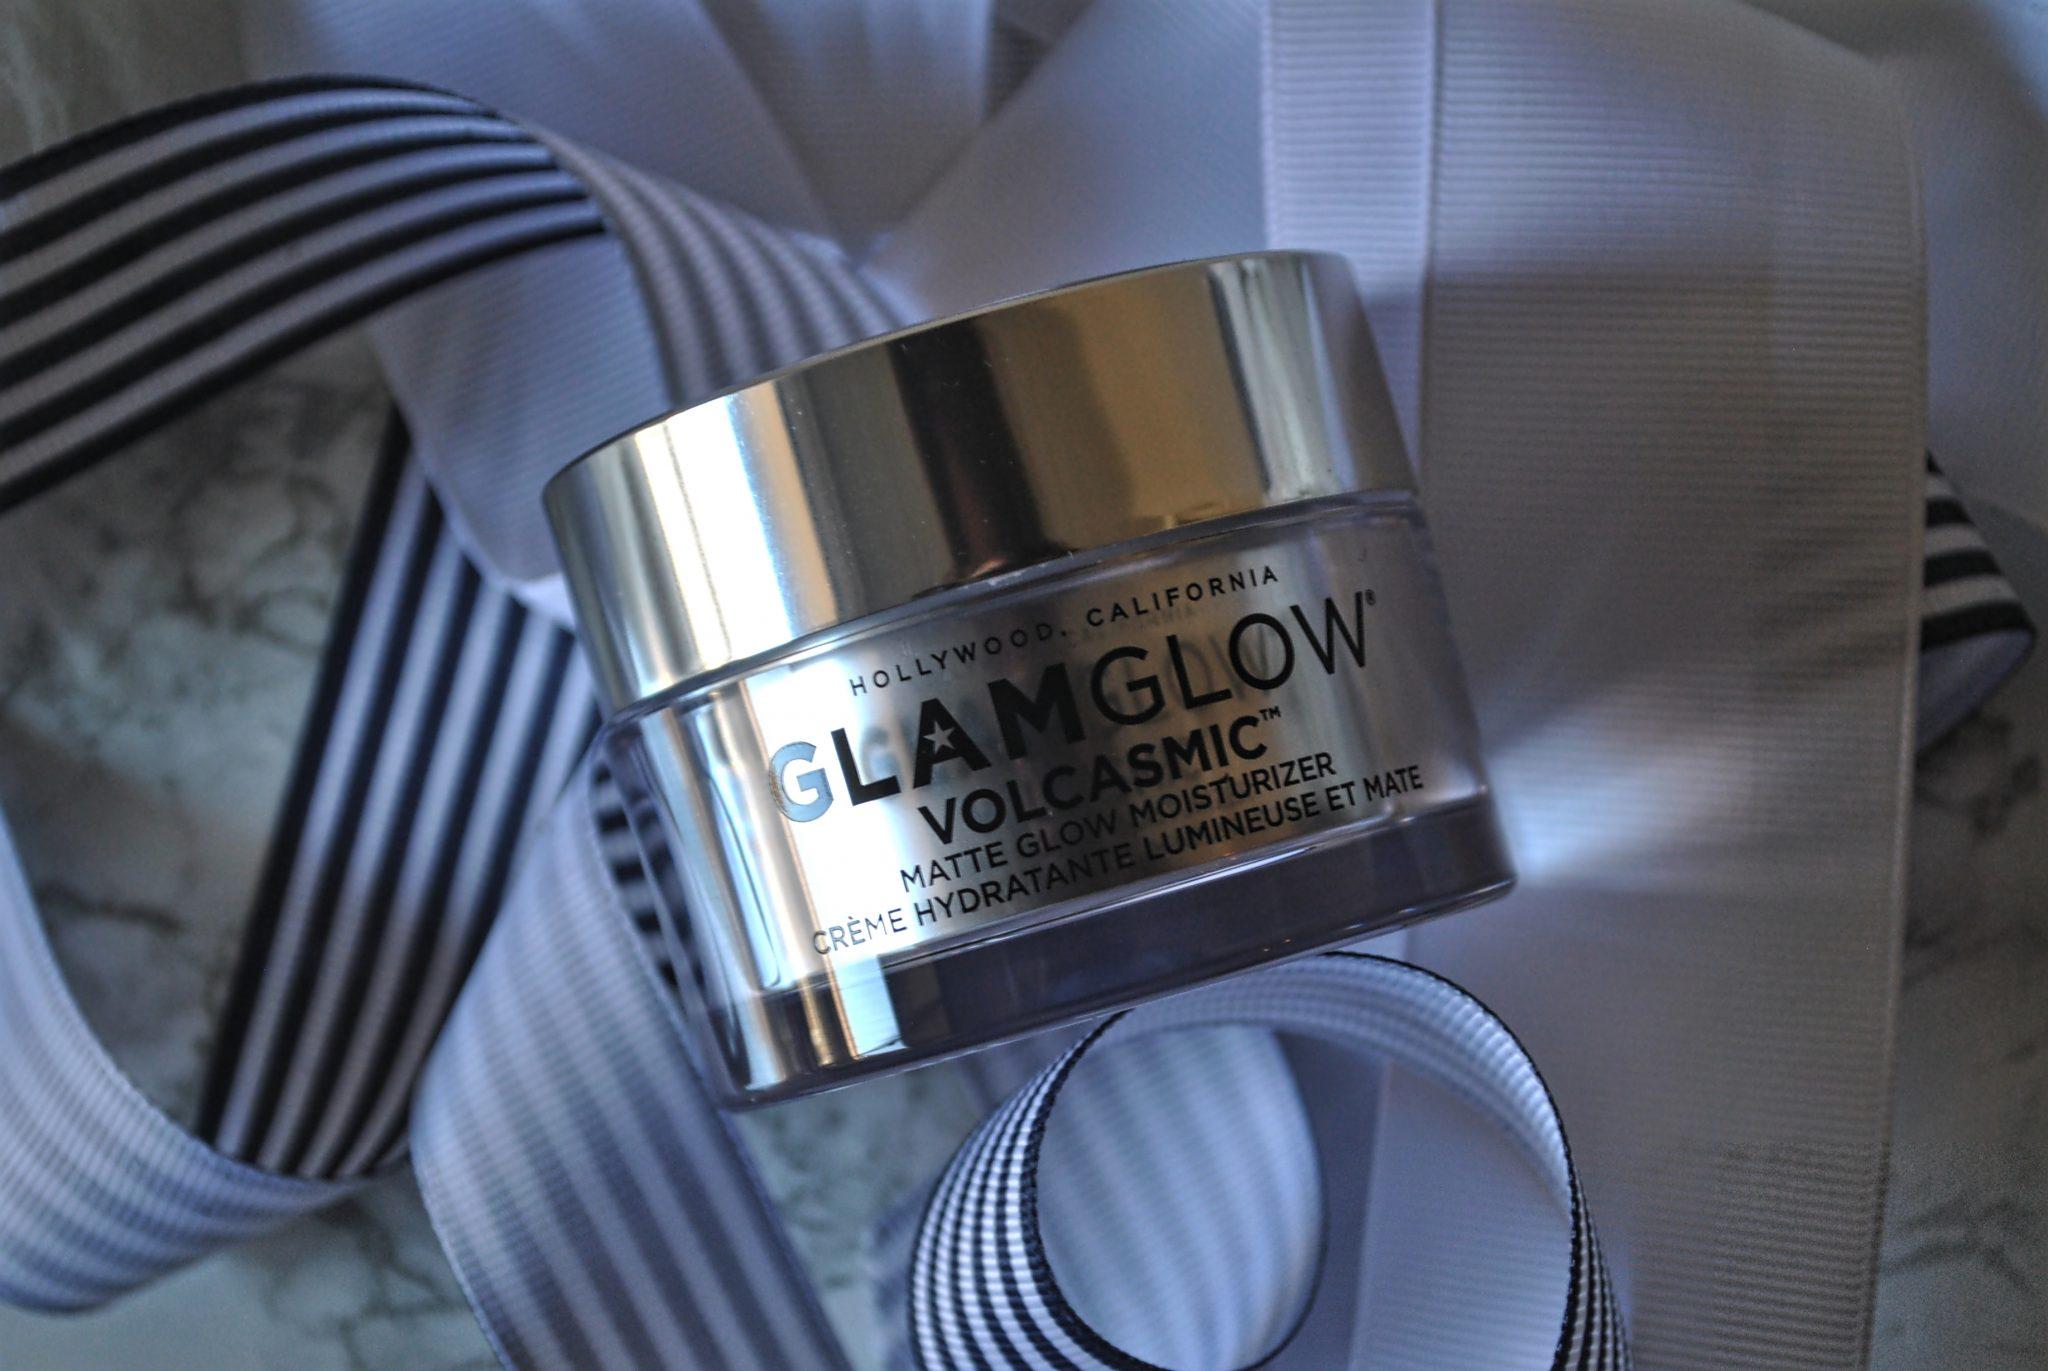 The-Hungarian-Brunette-Glamglow-Volgasmic-Beauty-Review.jpg